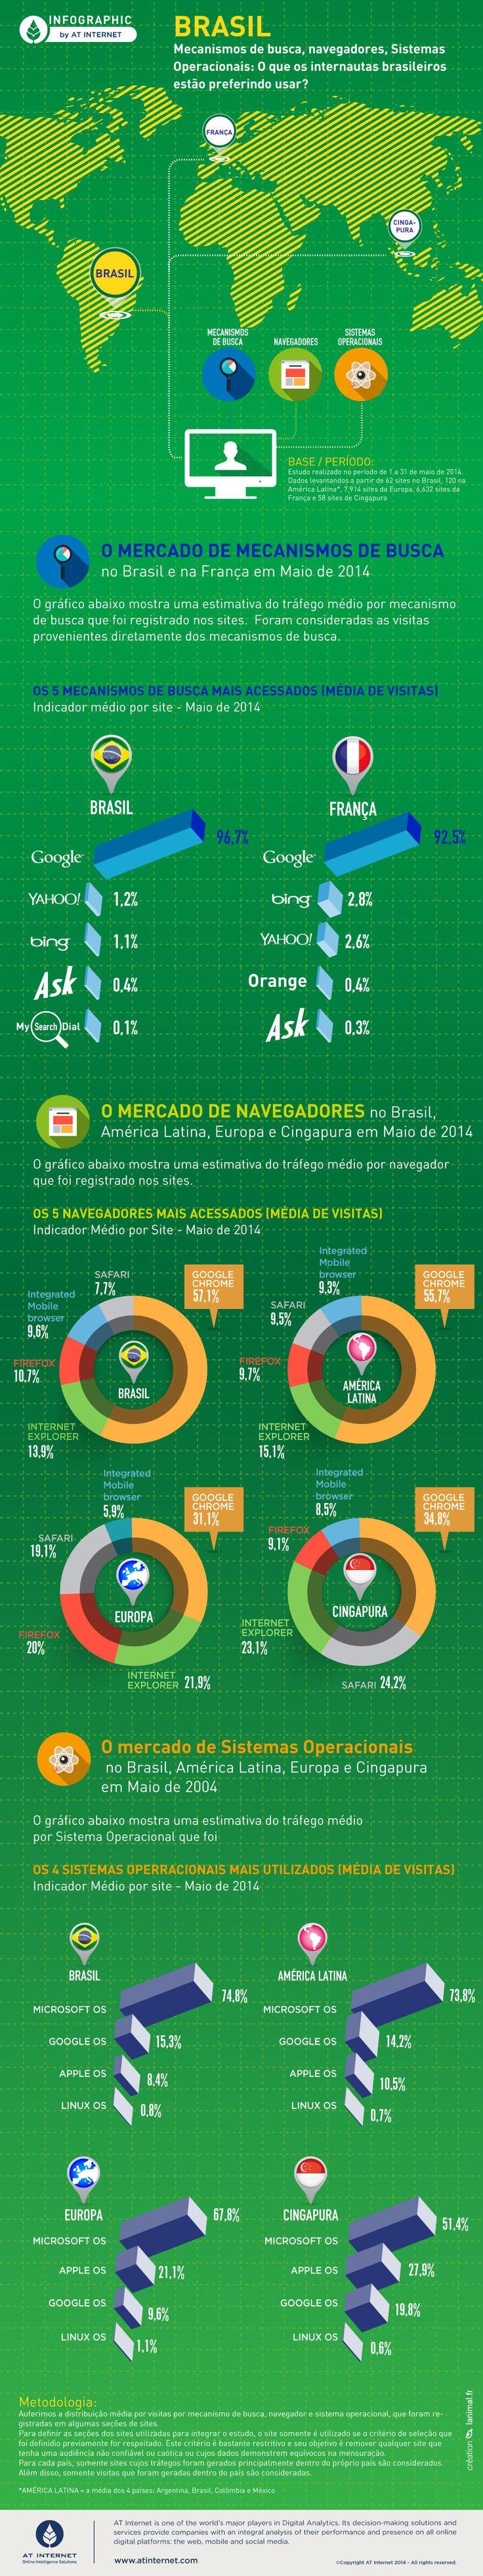 Preferências dos brasileiros na internet #navegadores #sistemasoperacionais #busca